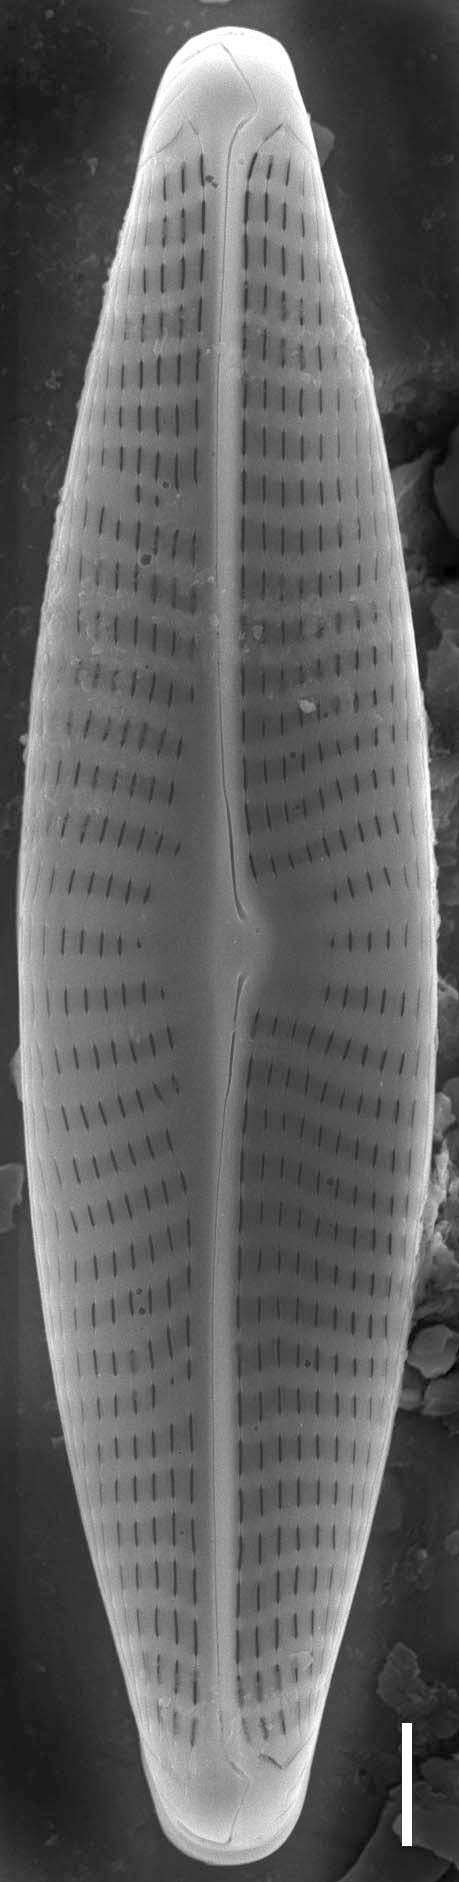 Navicula erifuga SEM2